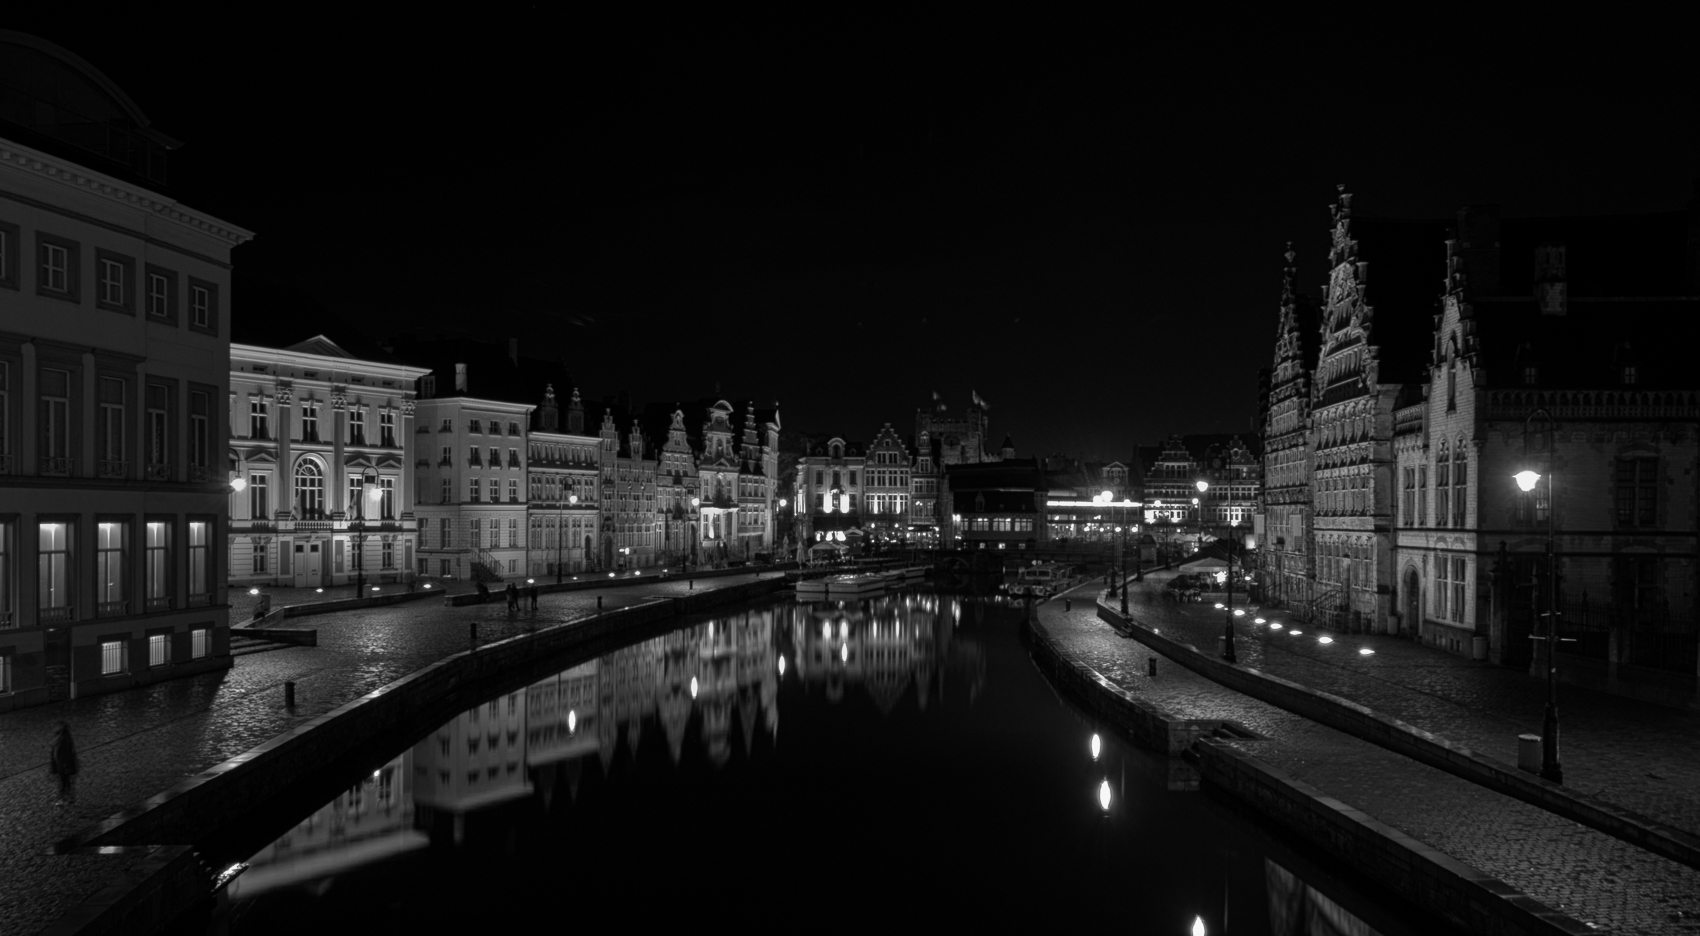 Graslei and Korenlei, Belgium